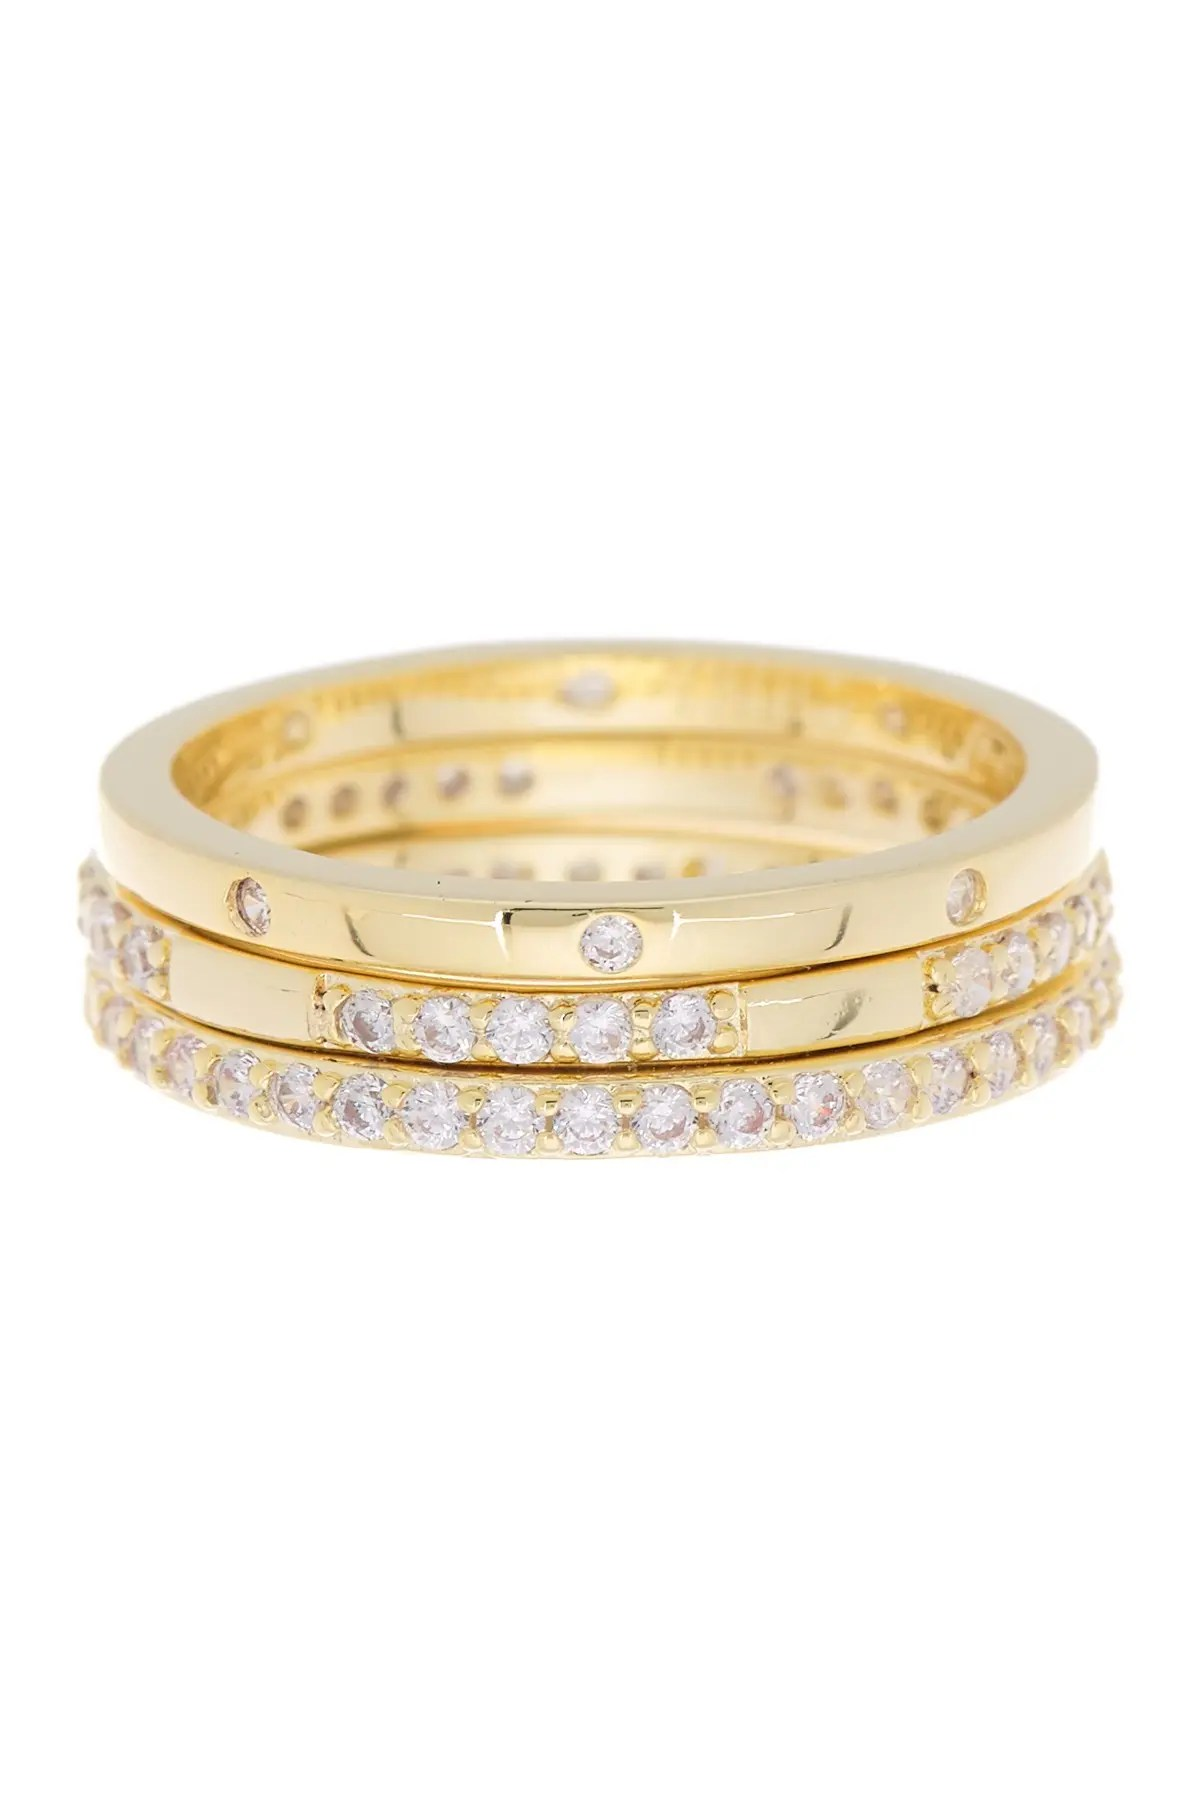 nordstrom rack jewelry for women